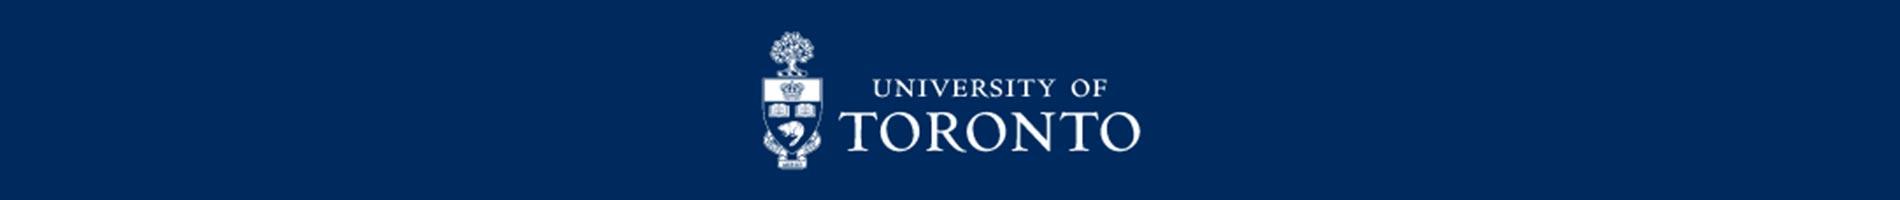 University of Toronto - Memory and Company